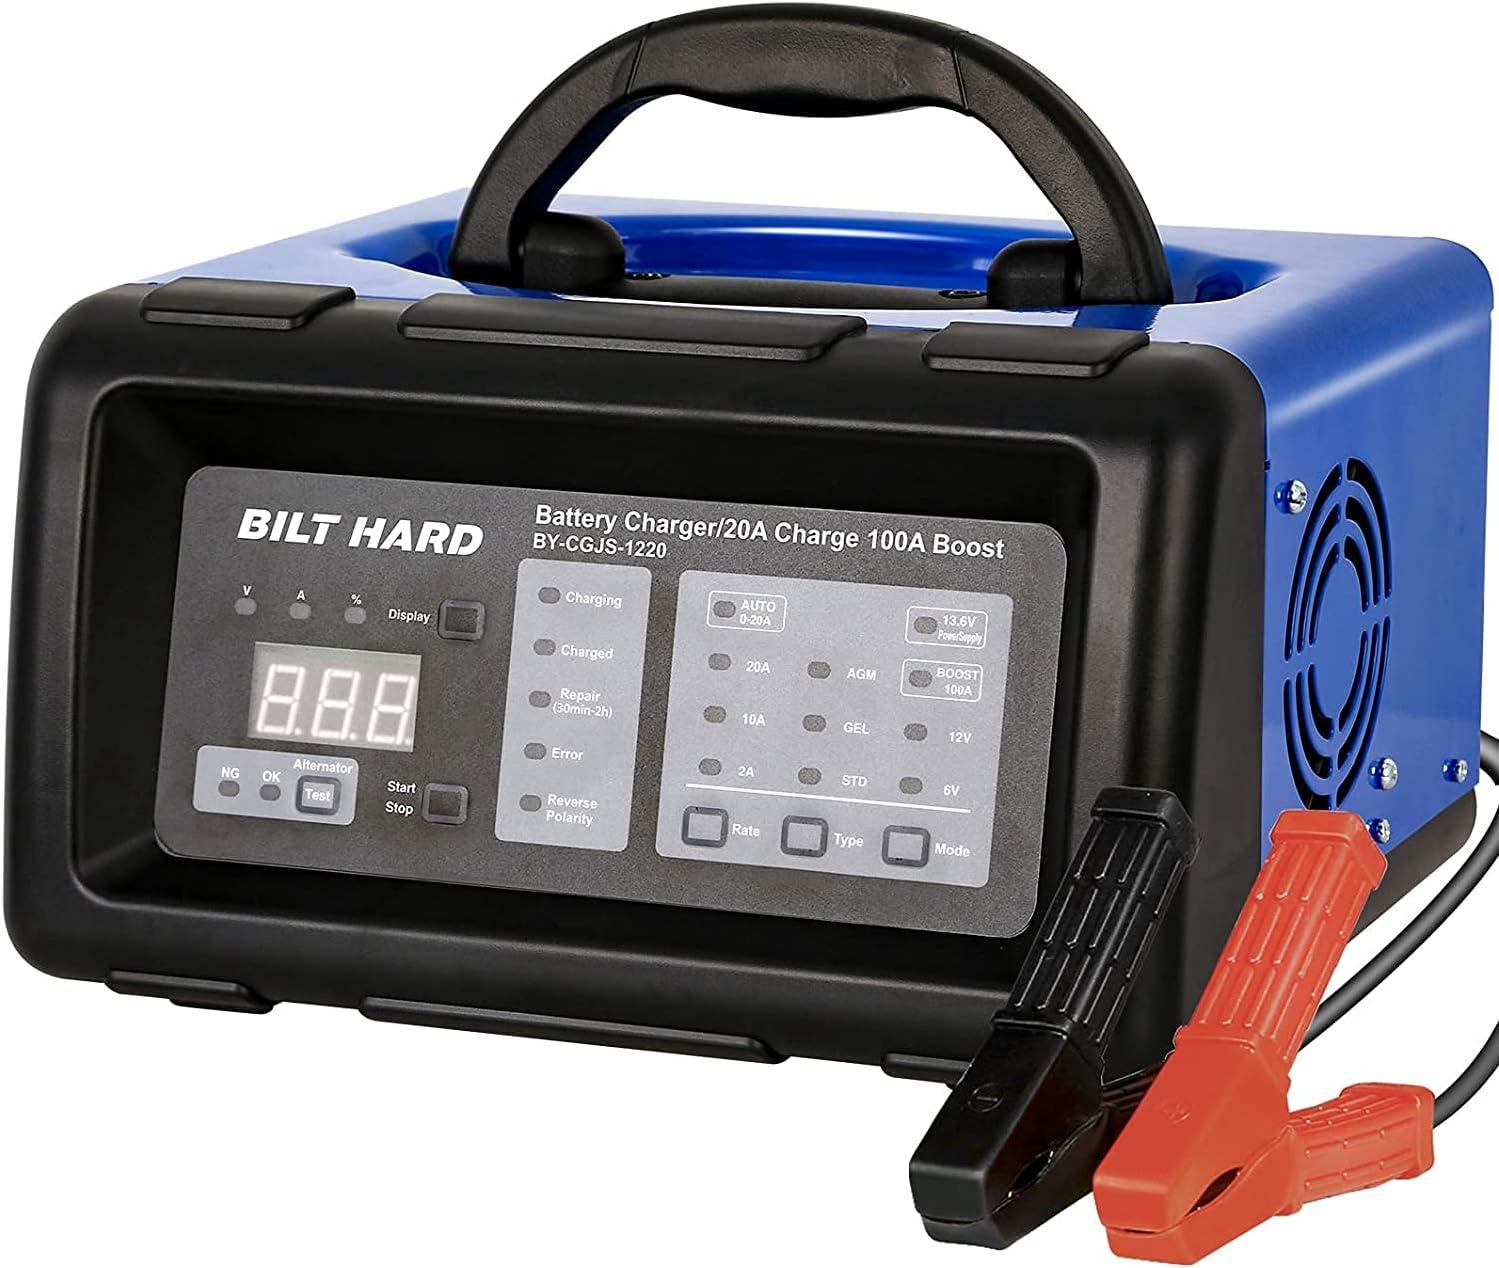 Bilt Hard Smart Battery Charger, Maintainer, Desulfator, and Diagnostic